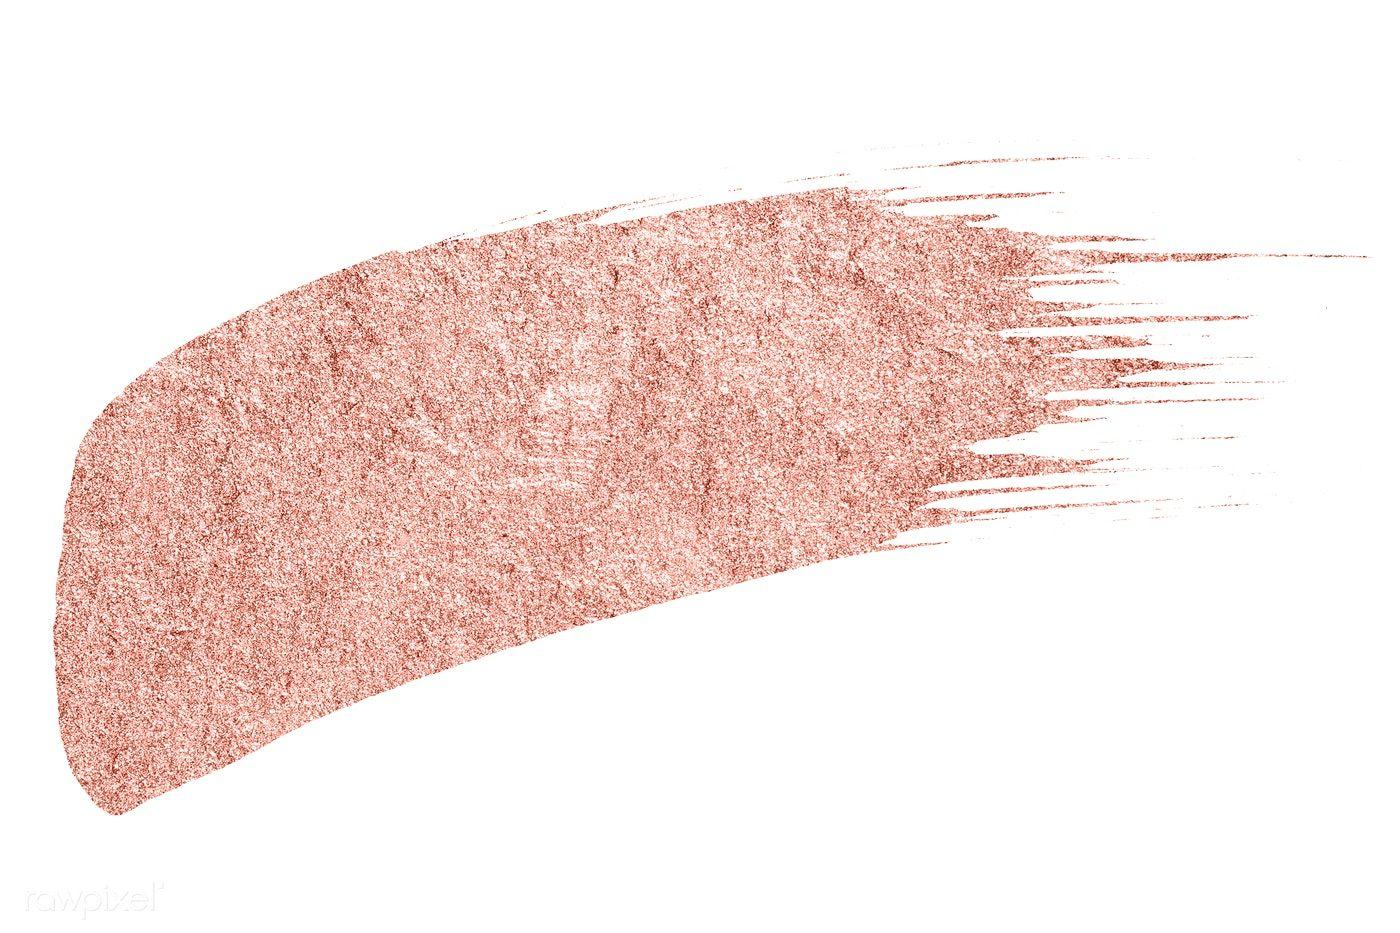 Download Premium Psd Of Festive Shimmery Pink Brush Stroke 552741 Pink Brushes Brush Strokes Sparkle Makeup